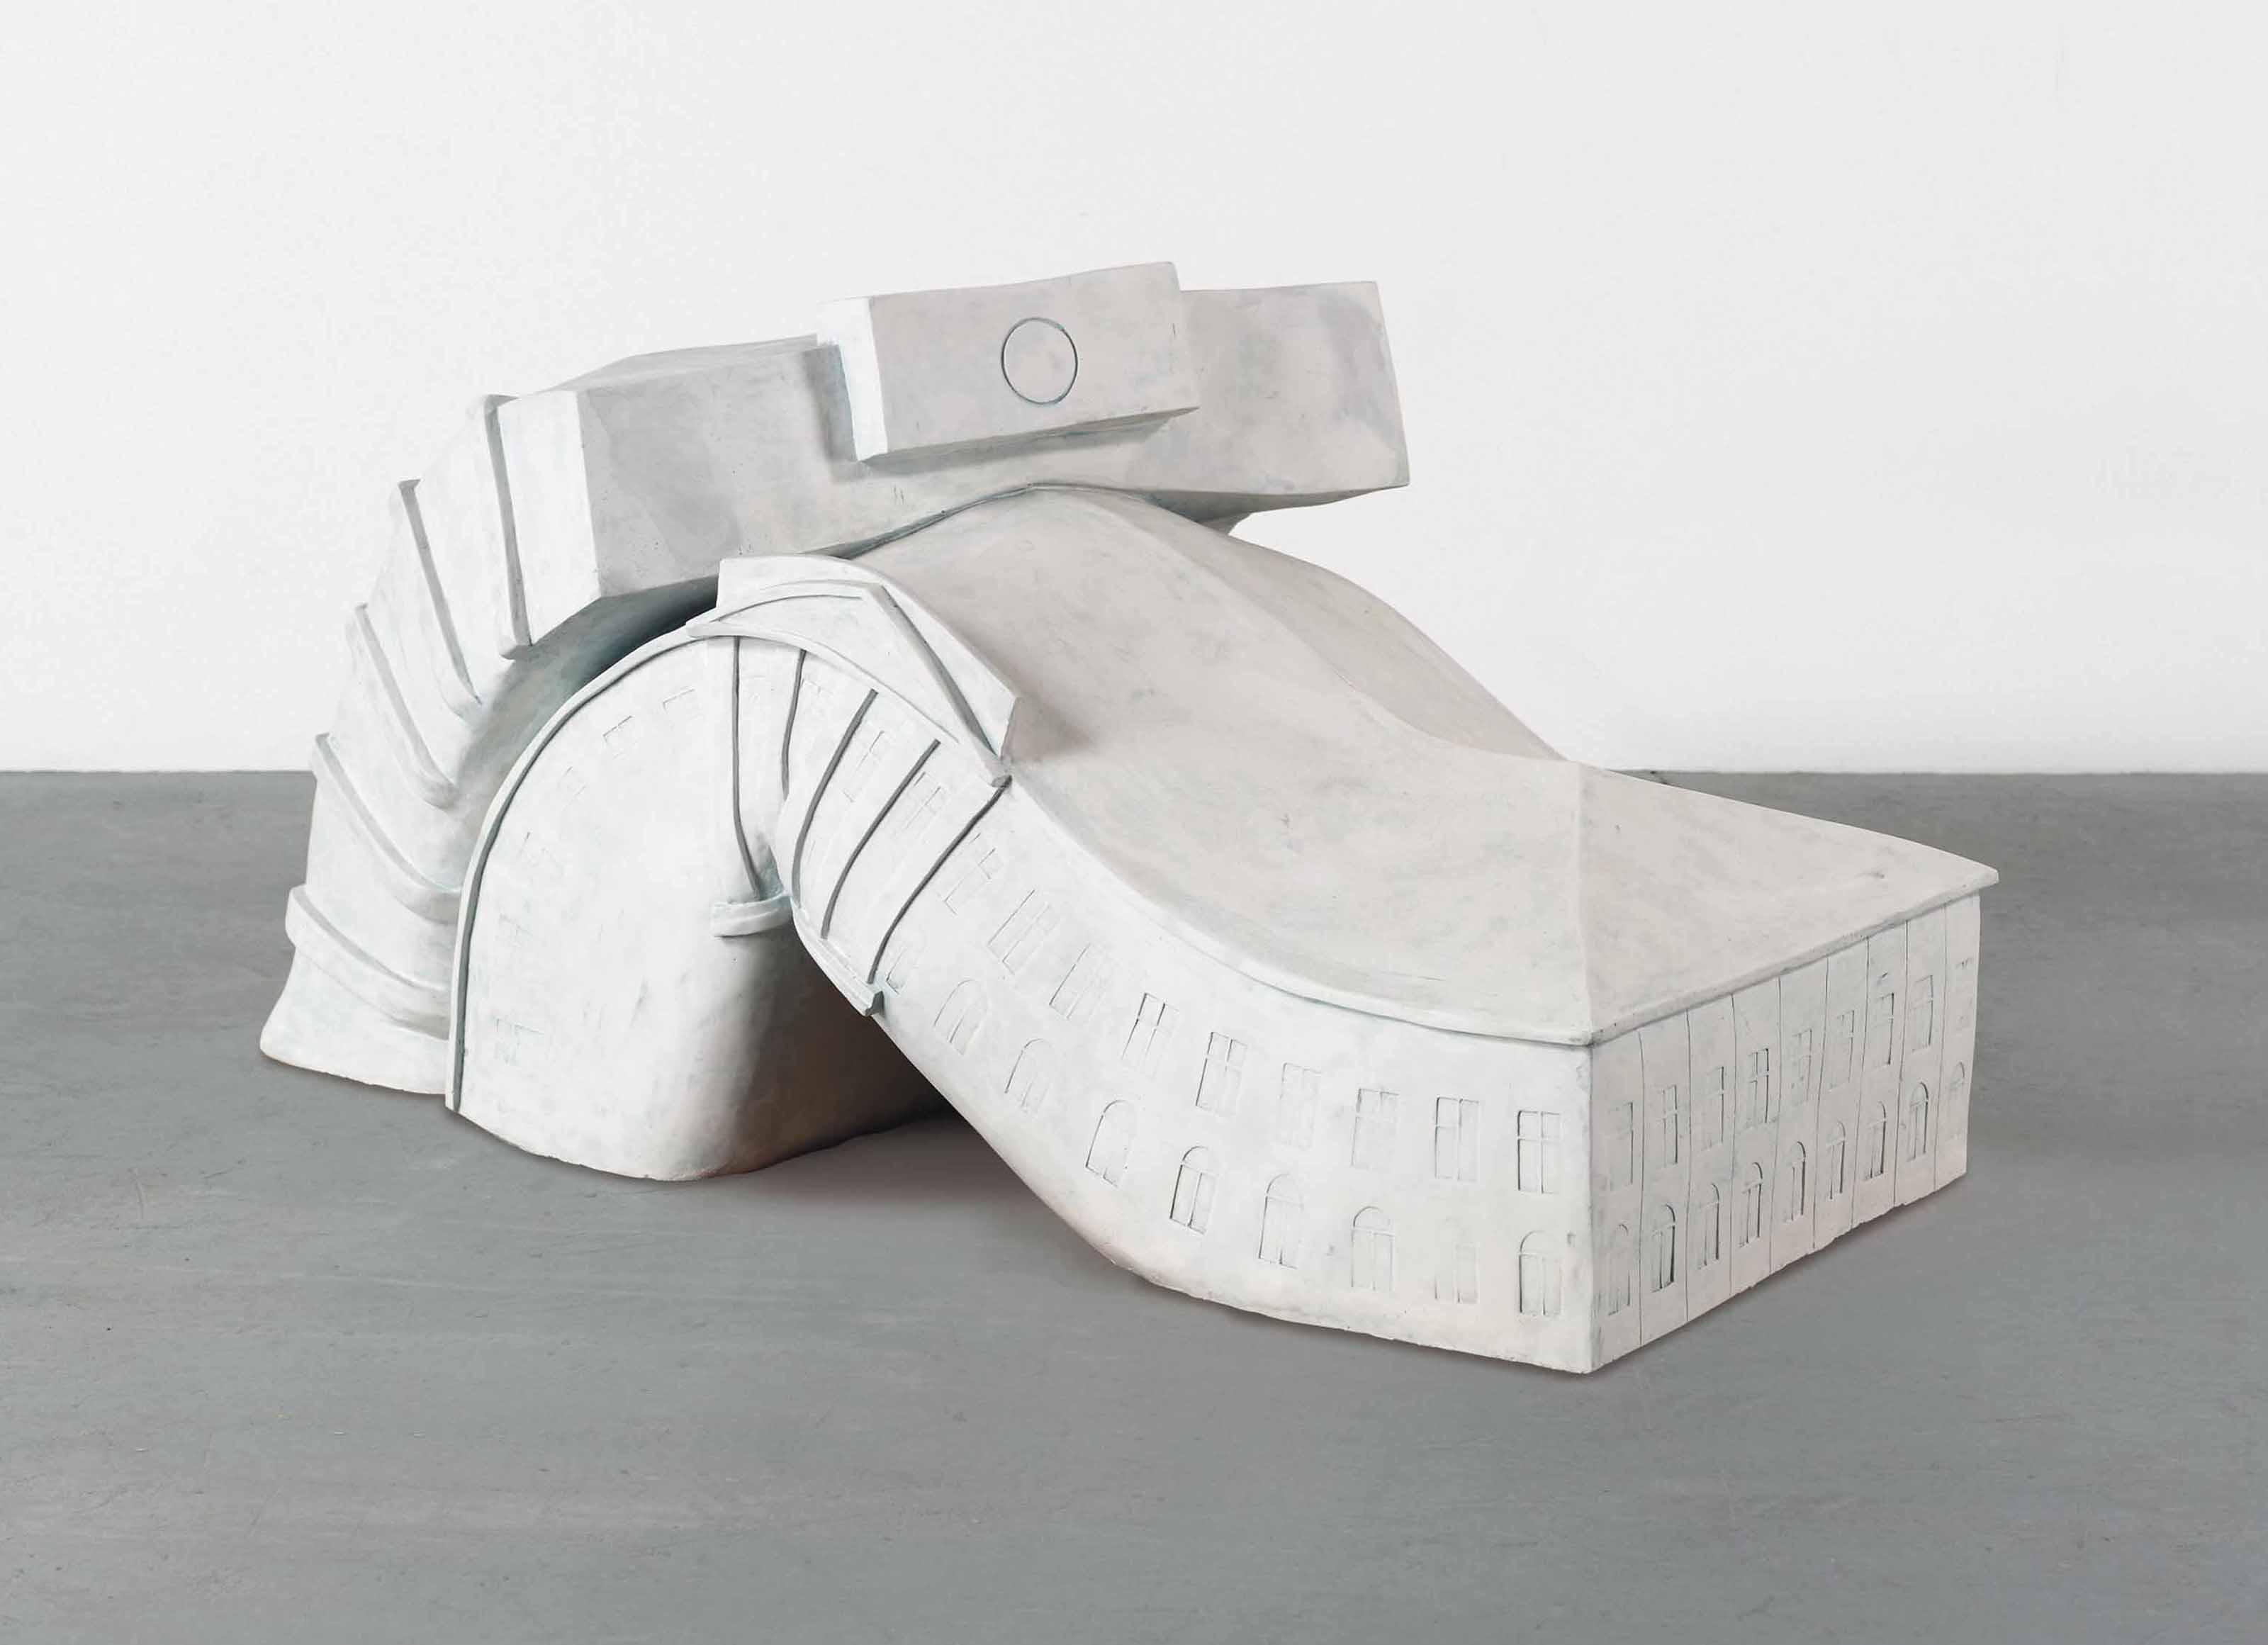 Art Basel f... Documenta